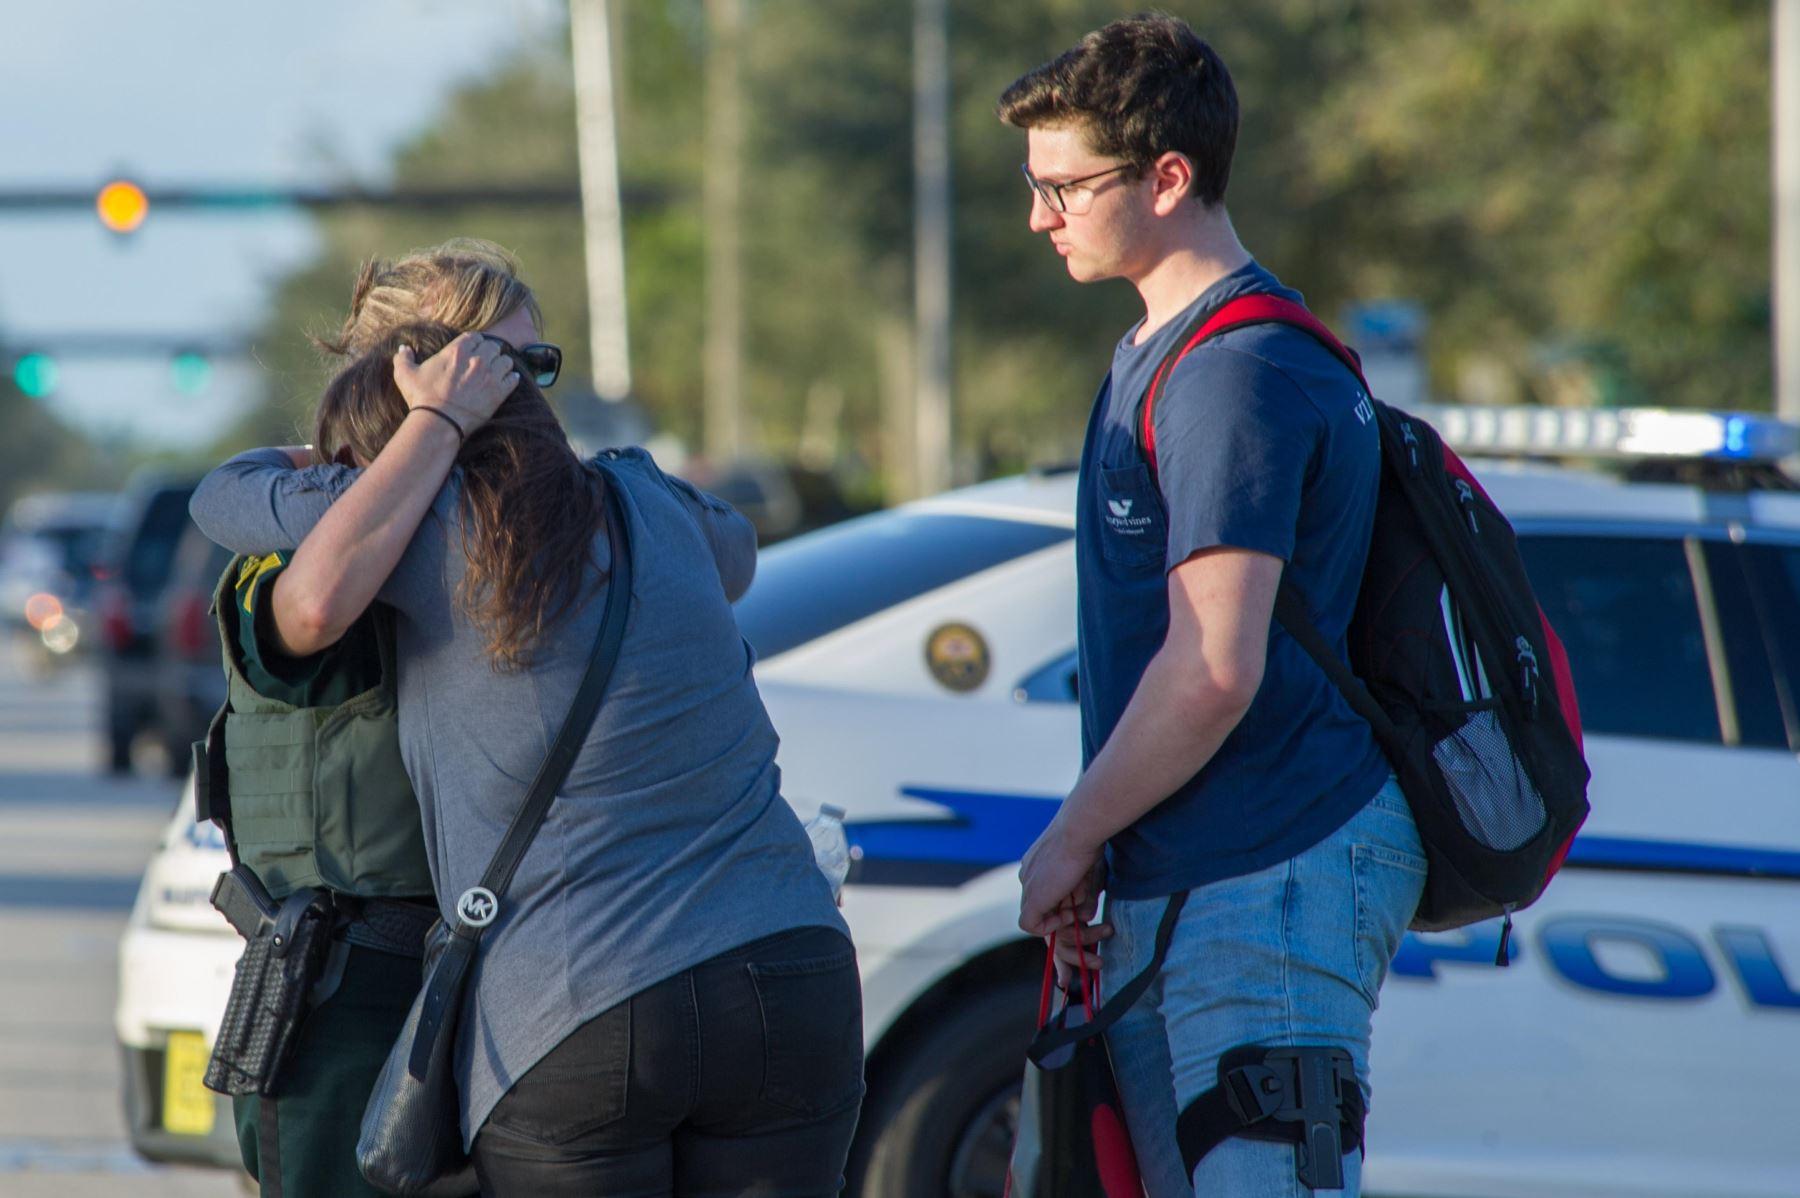 Asistente director deportivo víctimas tiroteo Florida